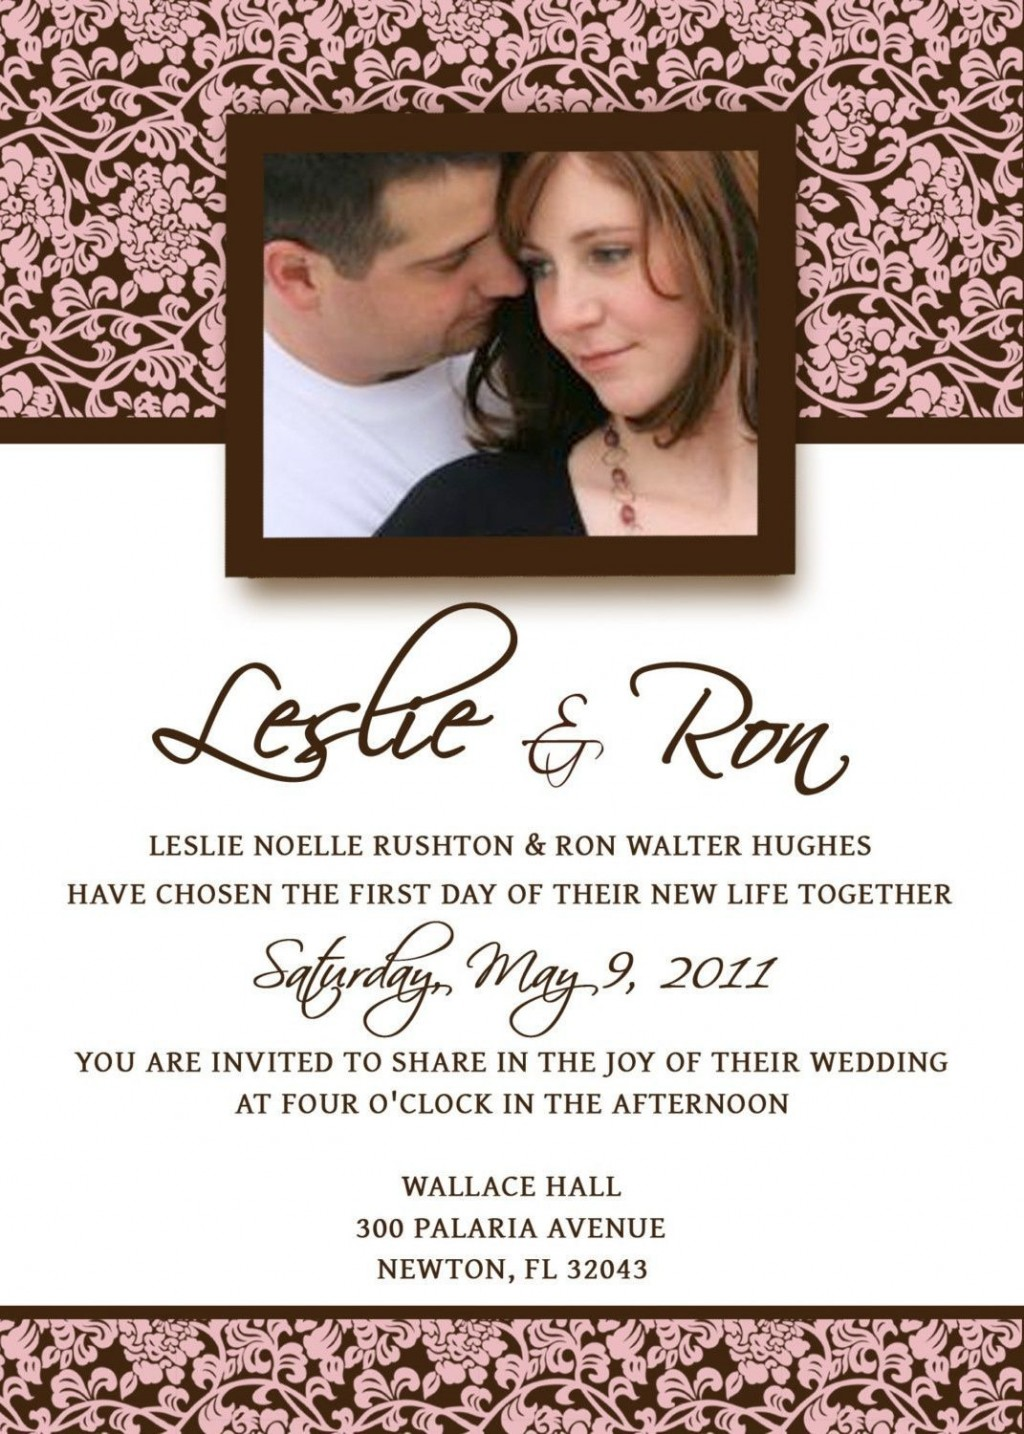 007 Incredible Sample Wedding Invitation Template Free Download Image  WordingLarge